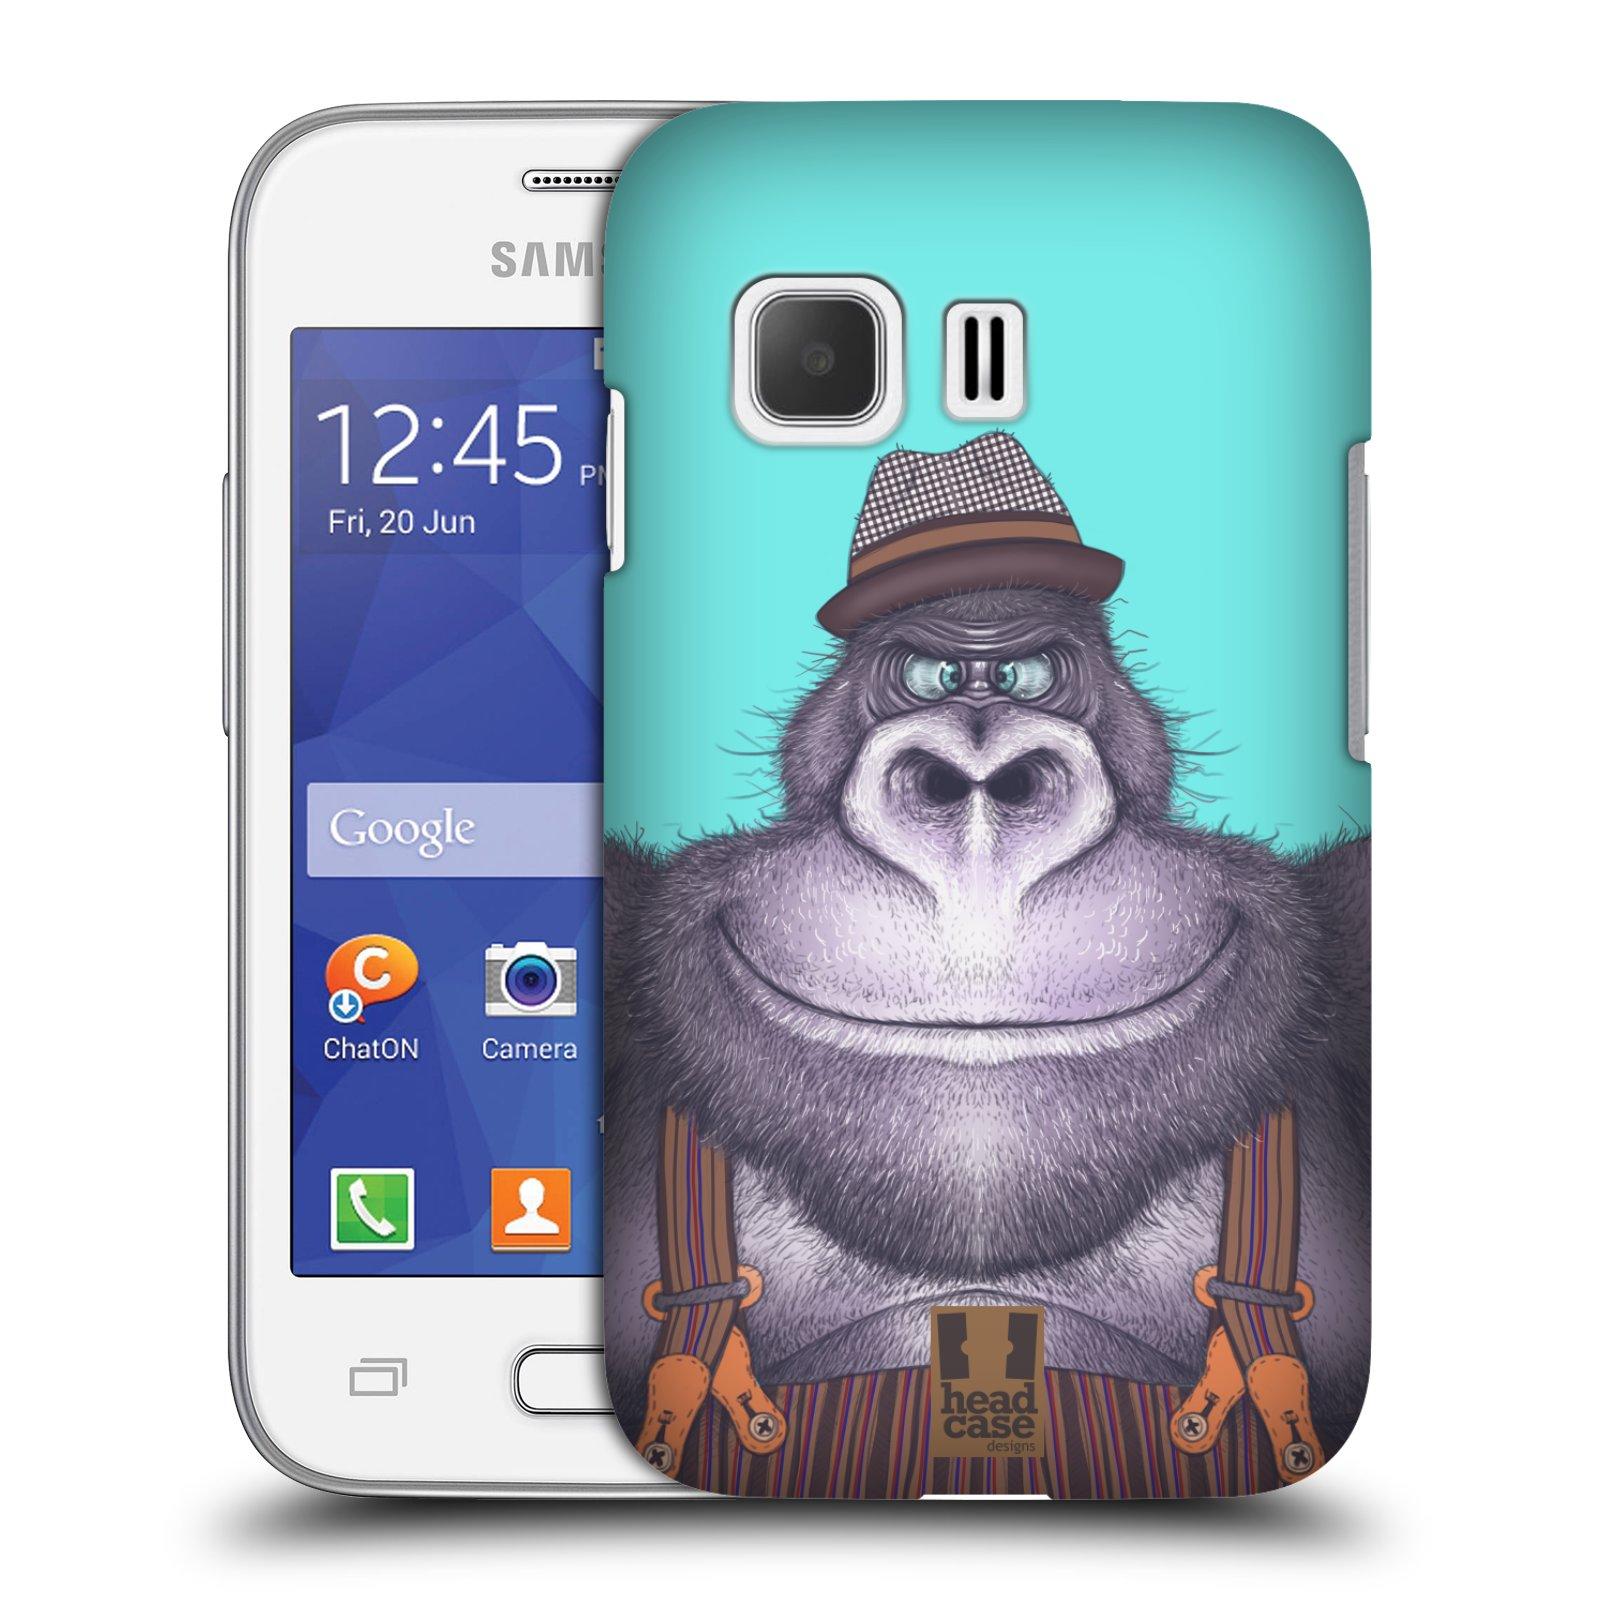 HEAD CASE plastový obal na mobil SAMSUNG Galaxy Young 2 (G130) vzor Kreslená zvířátka gorila